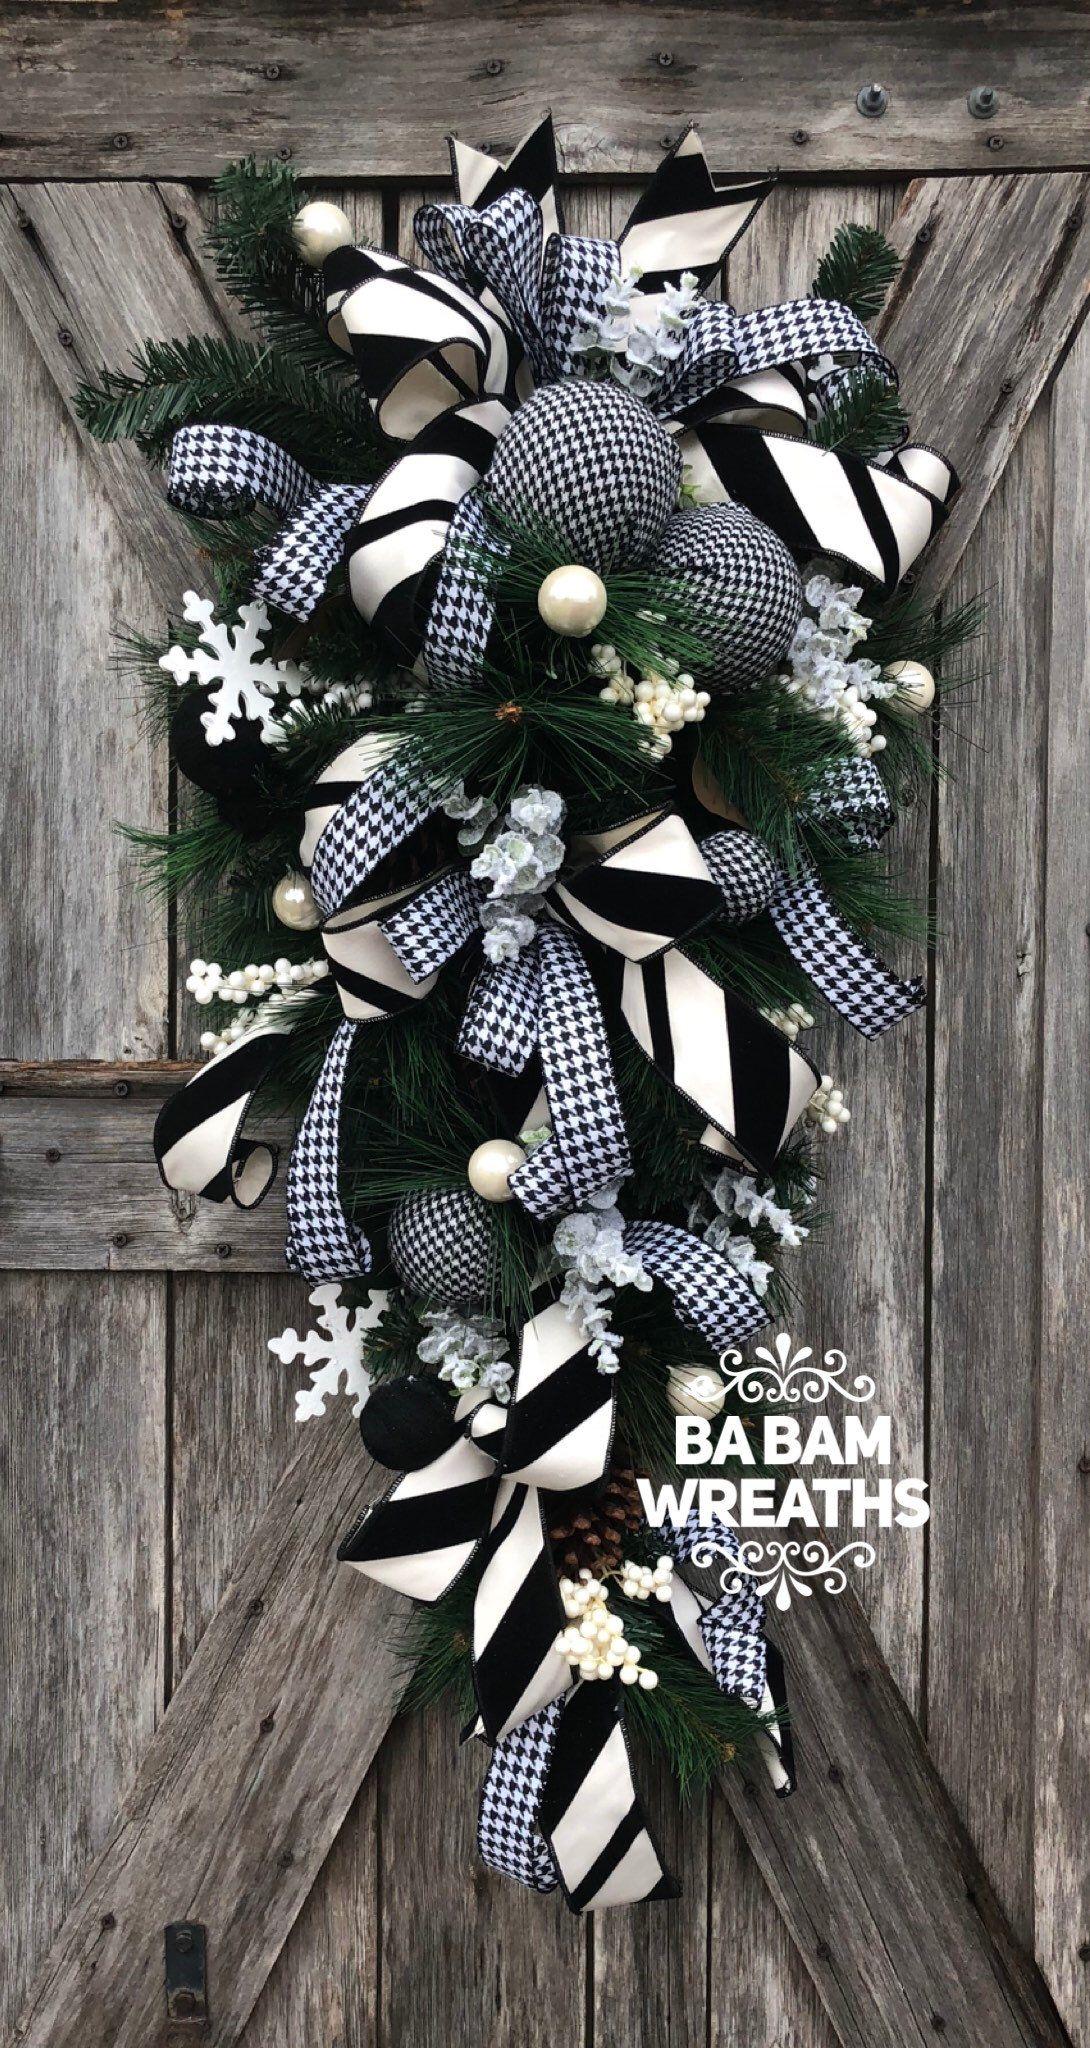 Ba Bam Wreaths Black White Christmas Decor Classic Christmas Christmas Swag Christmas Wreath Chr Christmas Wreaths Christmas Door Hangings Christmas Swags